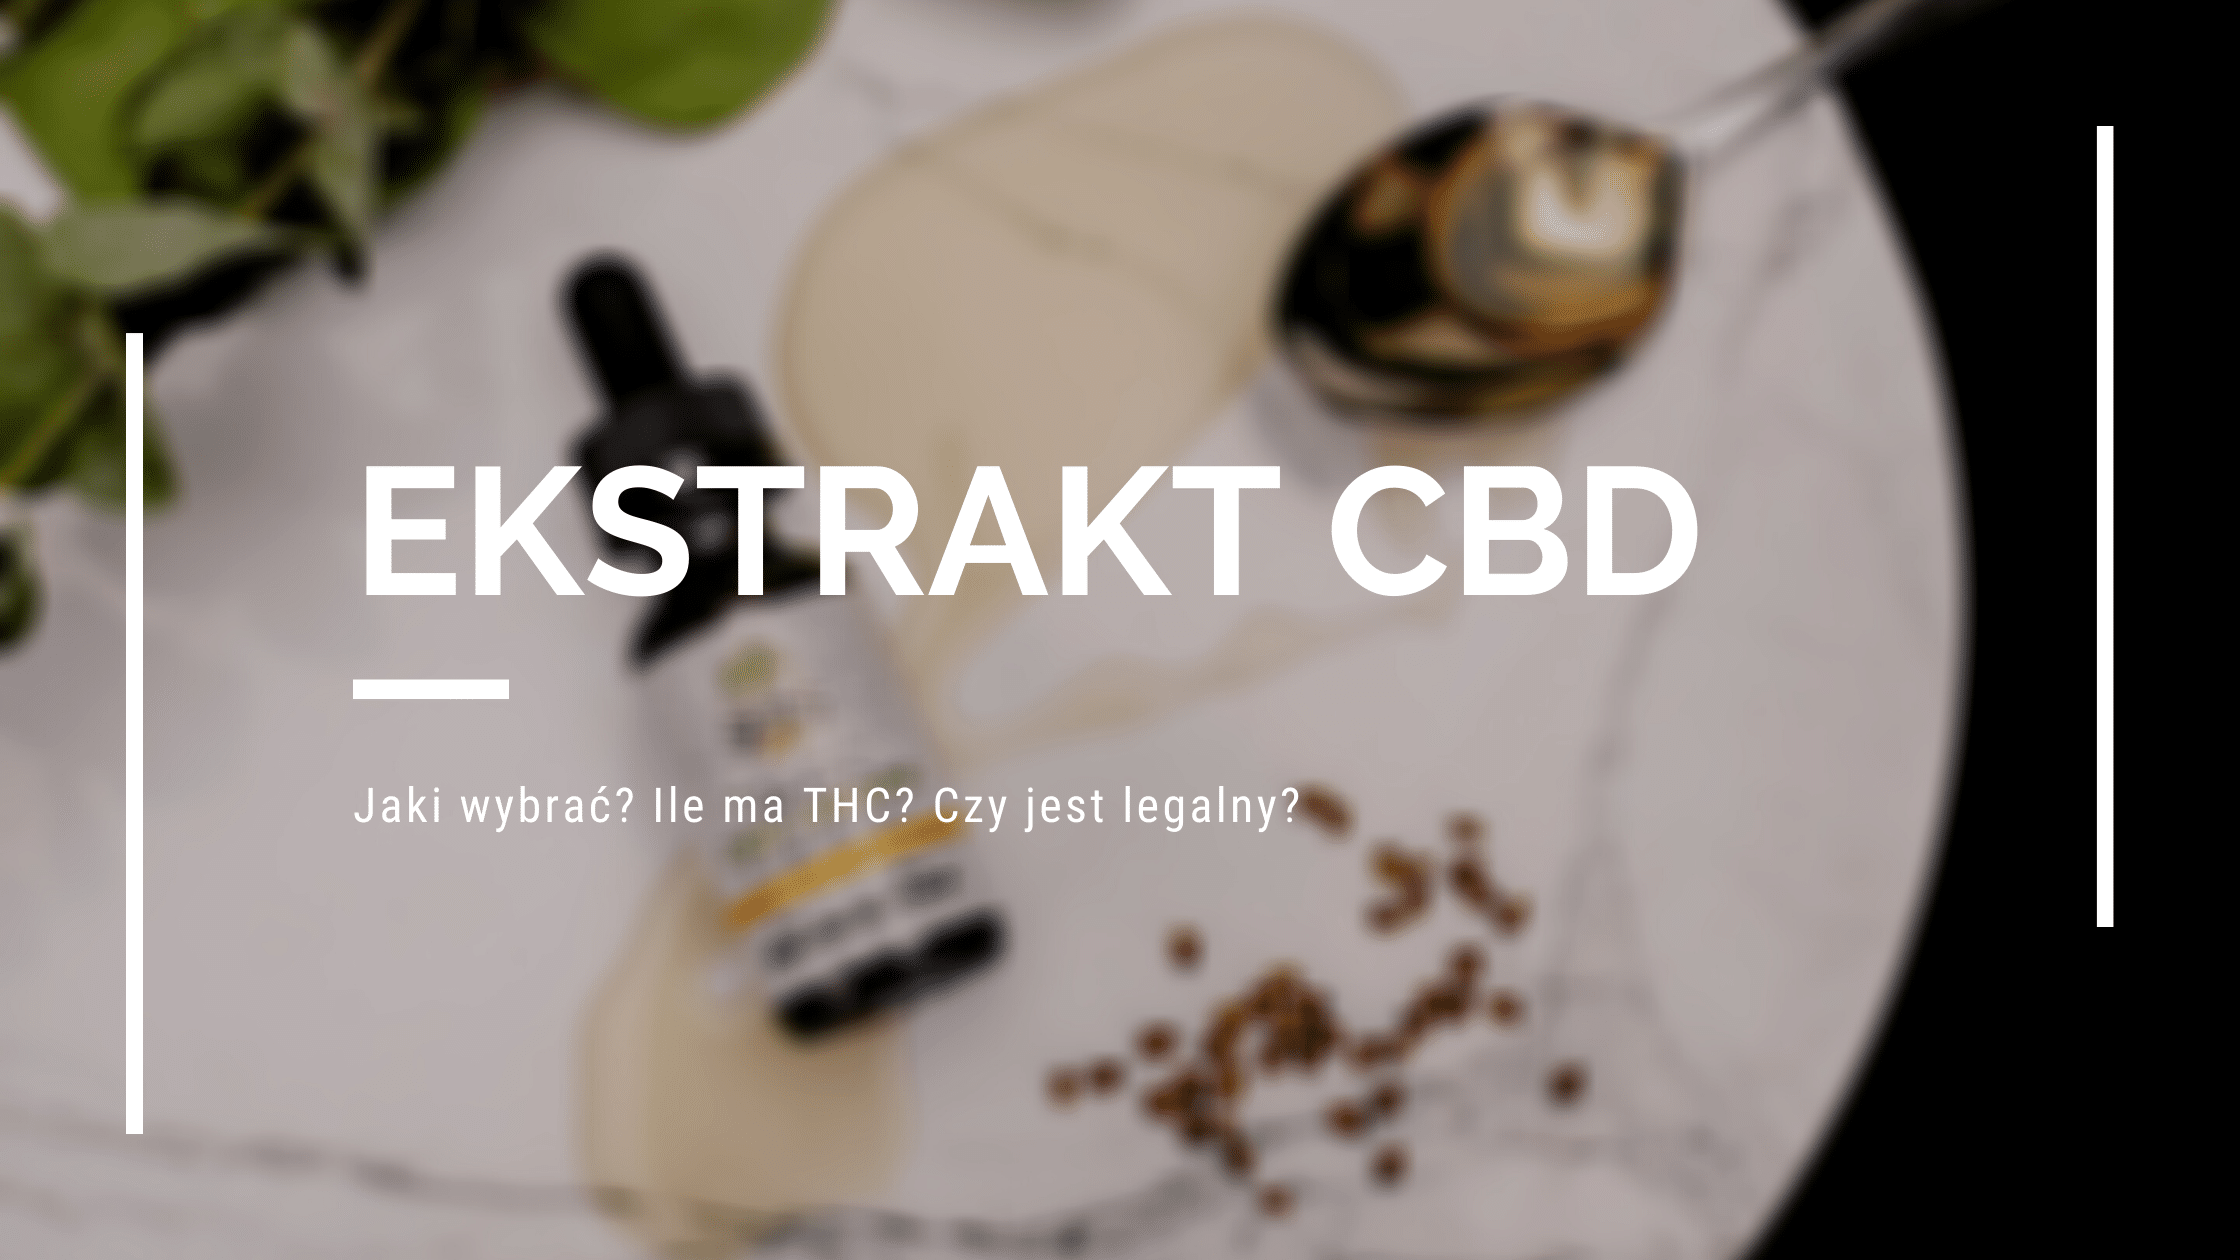 Jaki olejek/ekstrakt CBD wybrać? Ile ma THC? [PORADNIK]